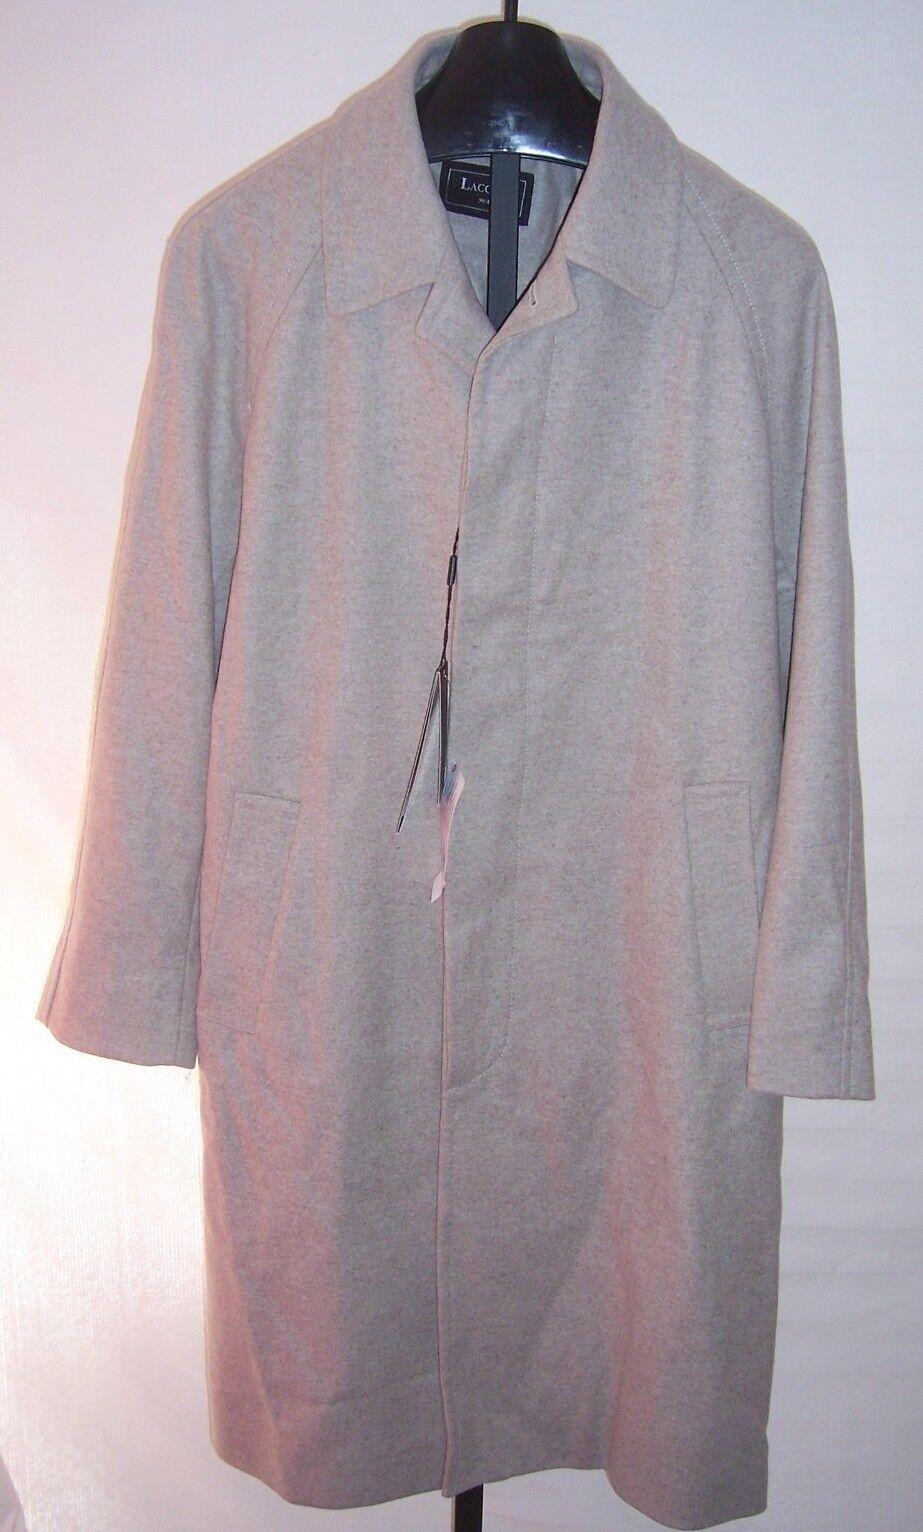 NWT Lacoste Light Brown Wool Blend Long Coat Mens Size Medium  (52 5)